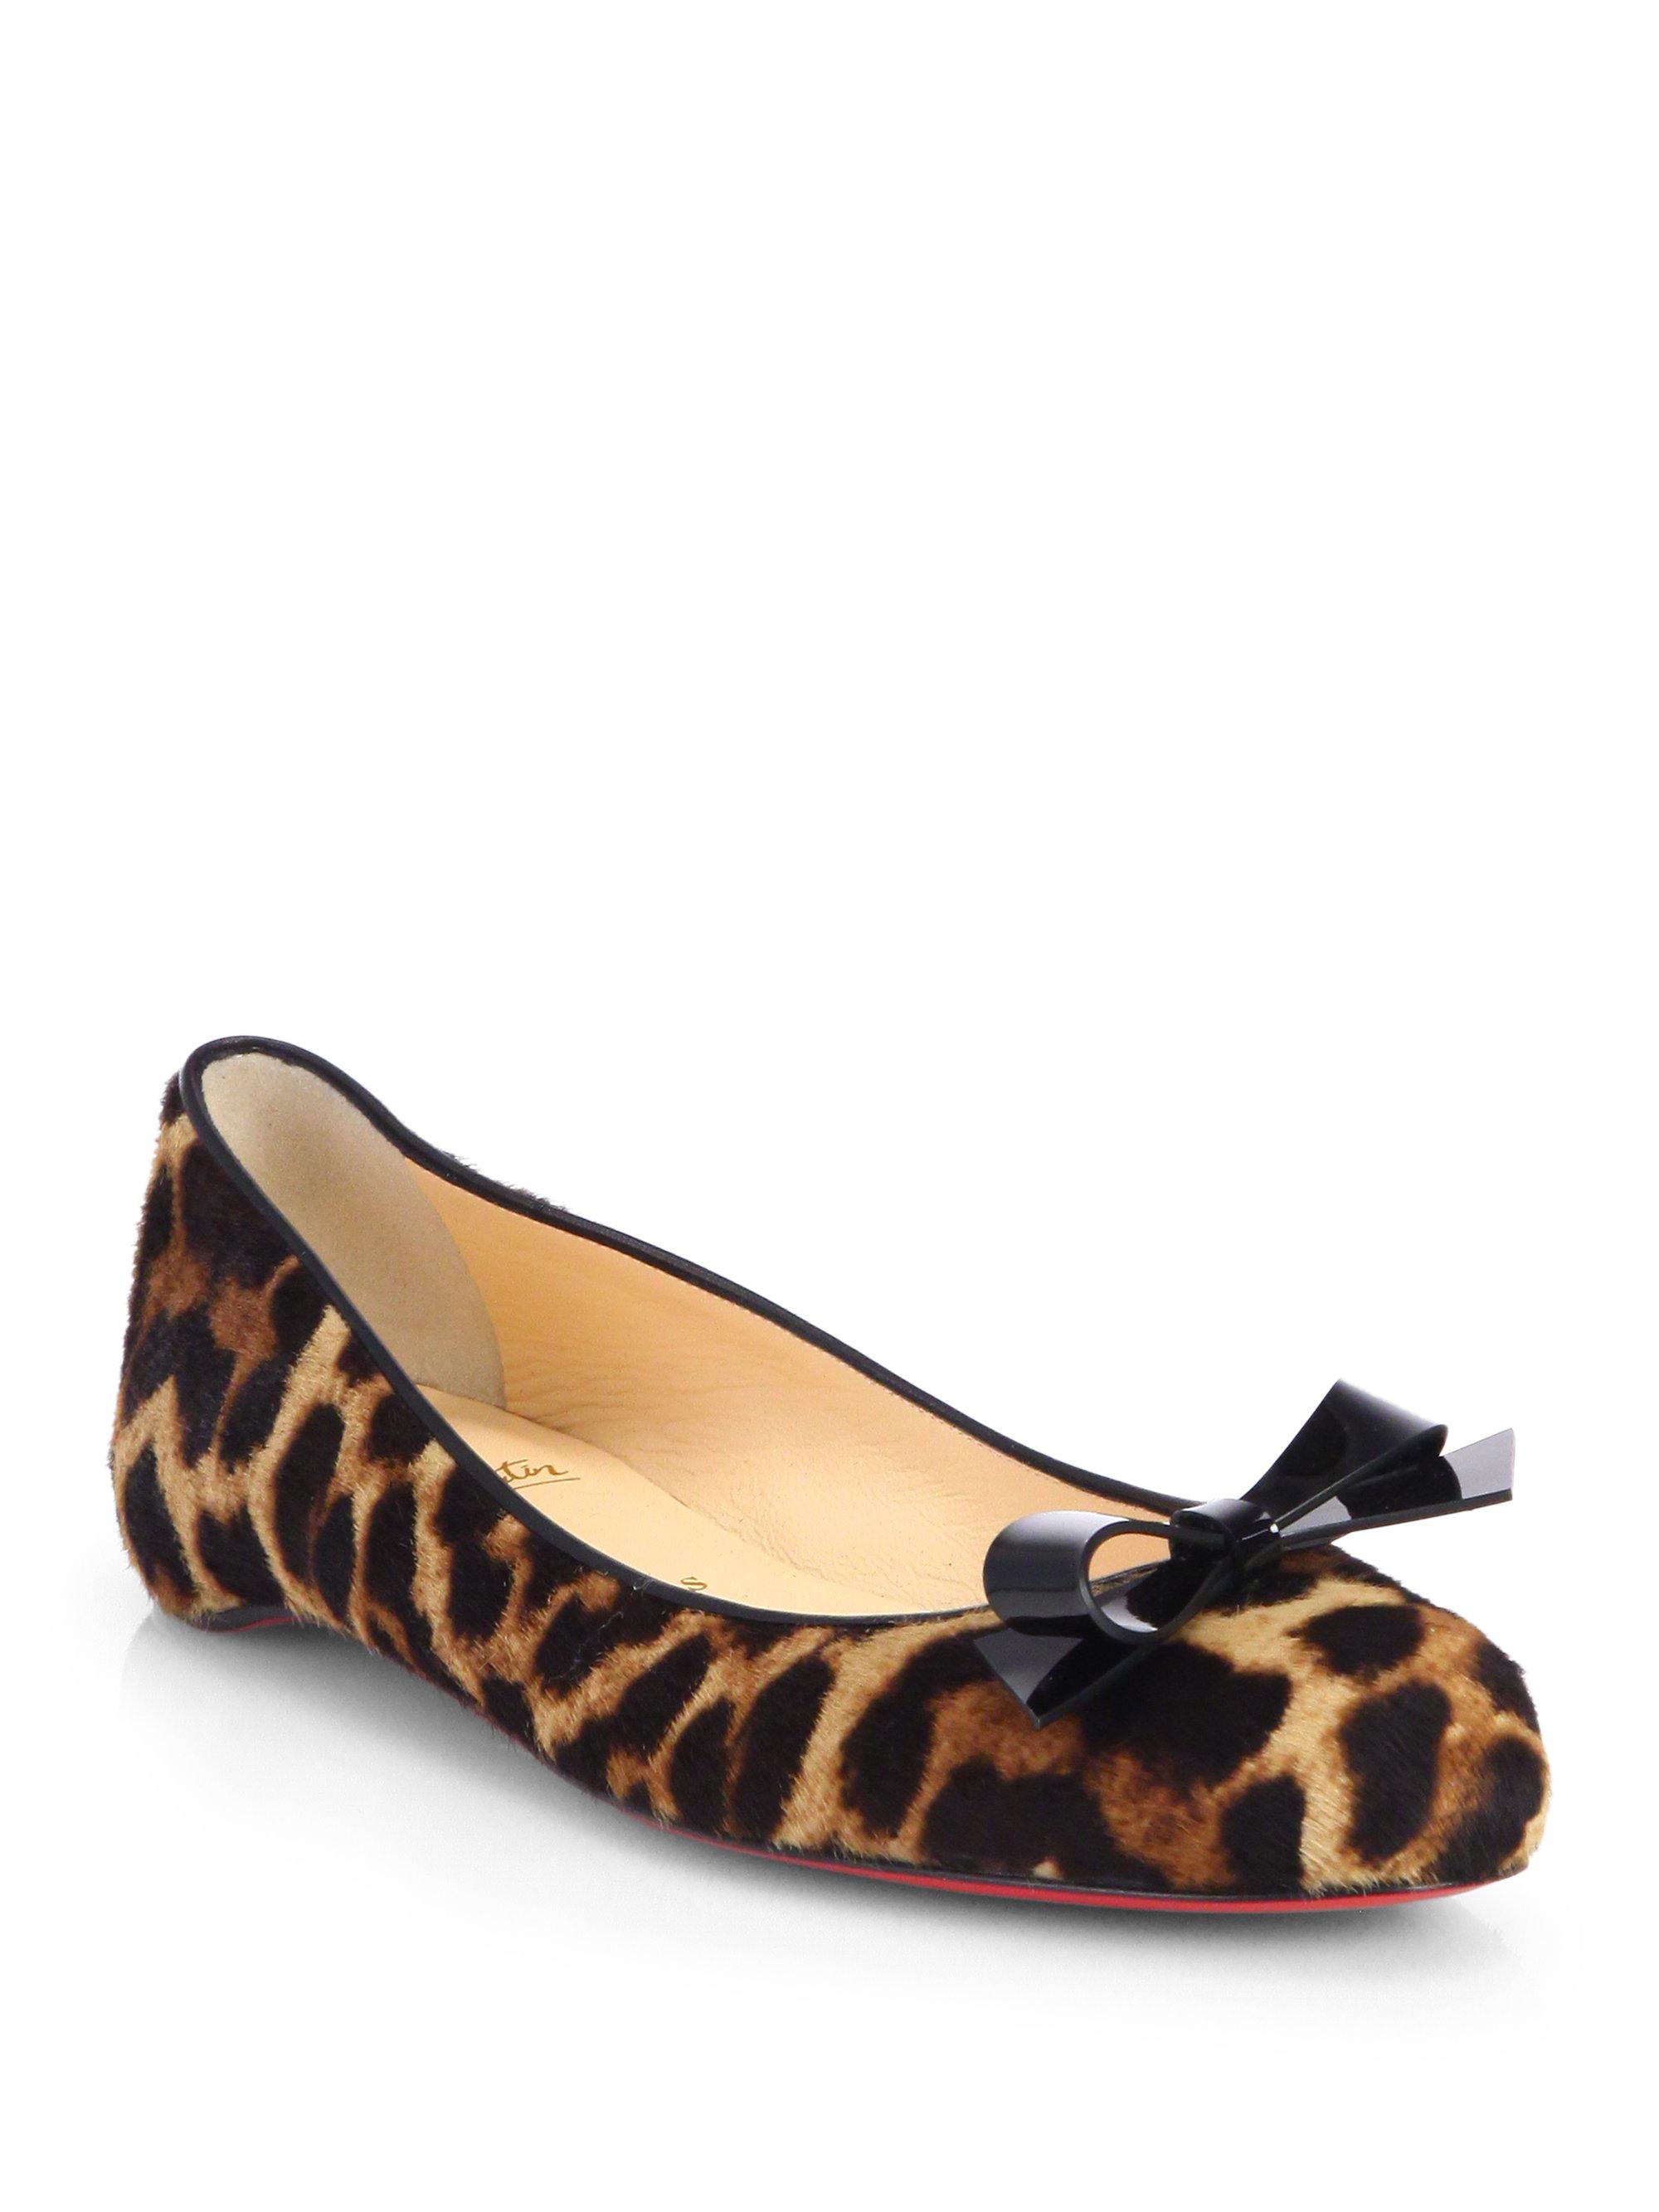 Christian louboutin Simplenodo Leopard-Print Calf Hair Ballet ...